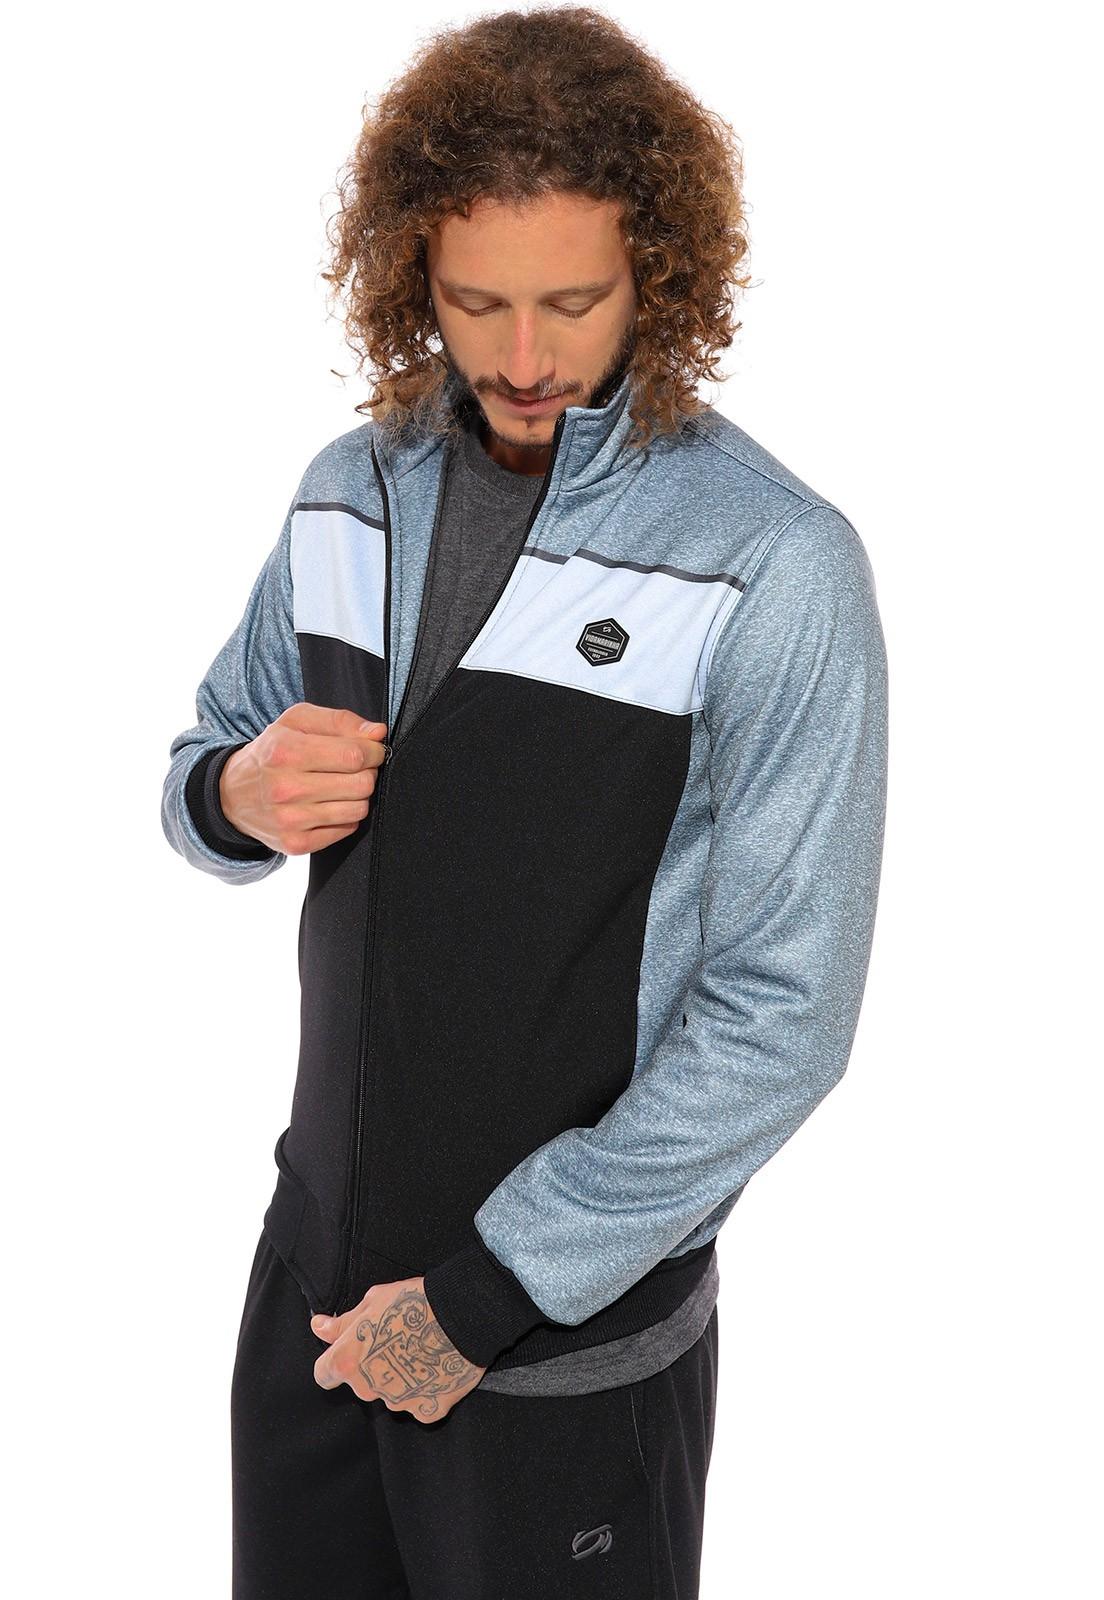 Jaqueta de Helanca Vida Marinha Azul/Preto